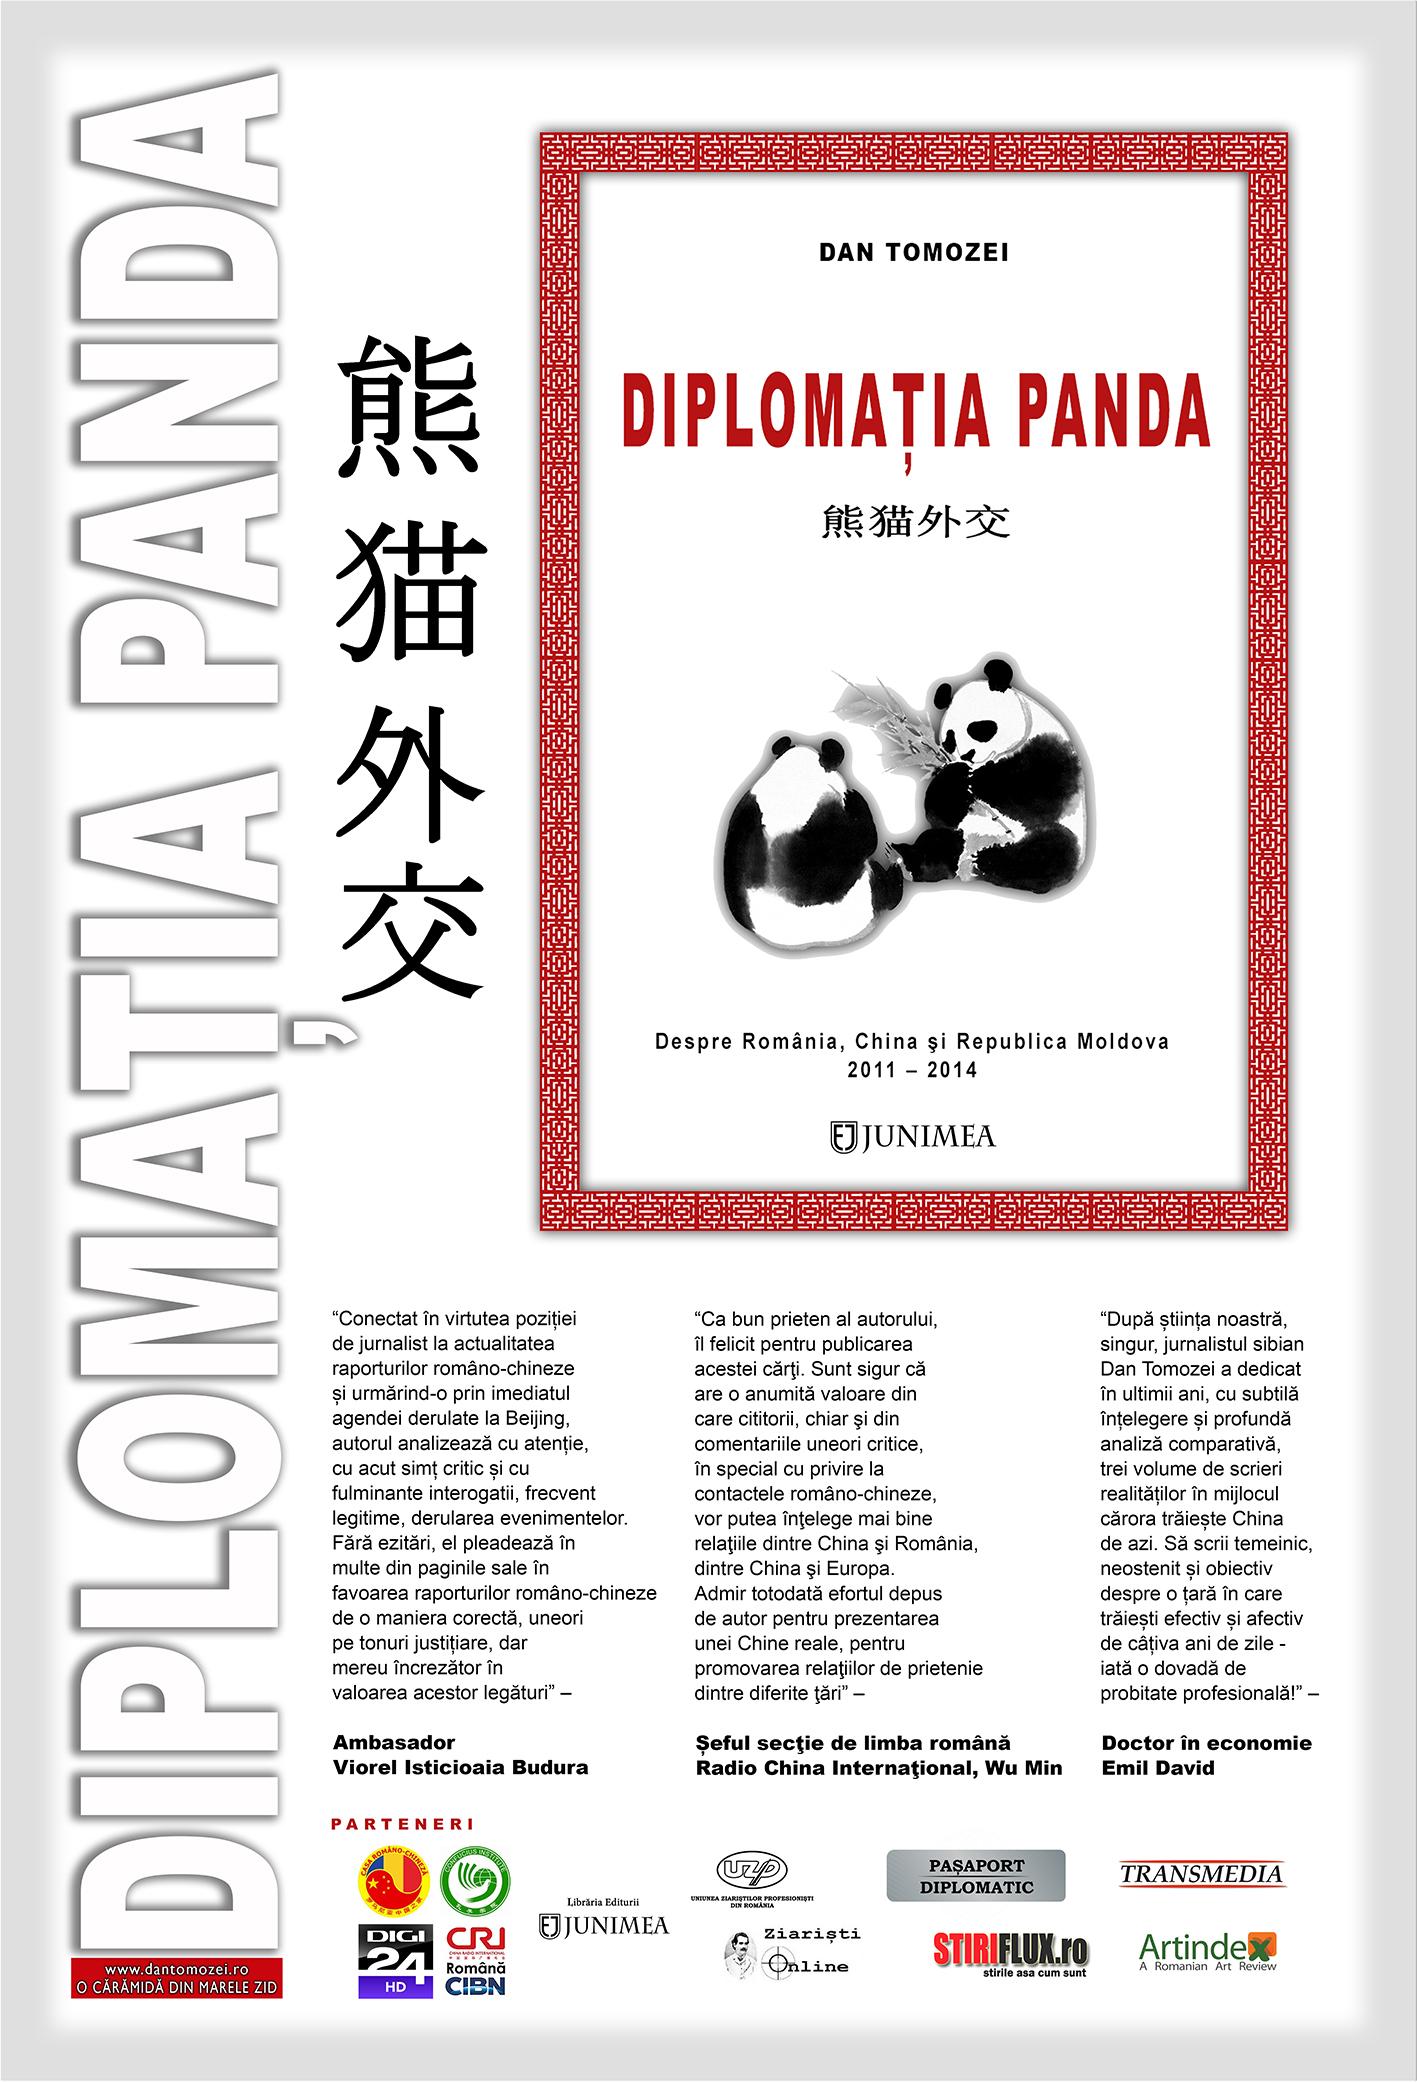 Diplomatia Panda, un nou volum semnat Dan Tomozei - Afis